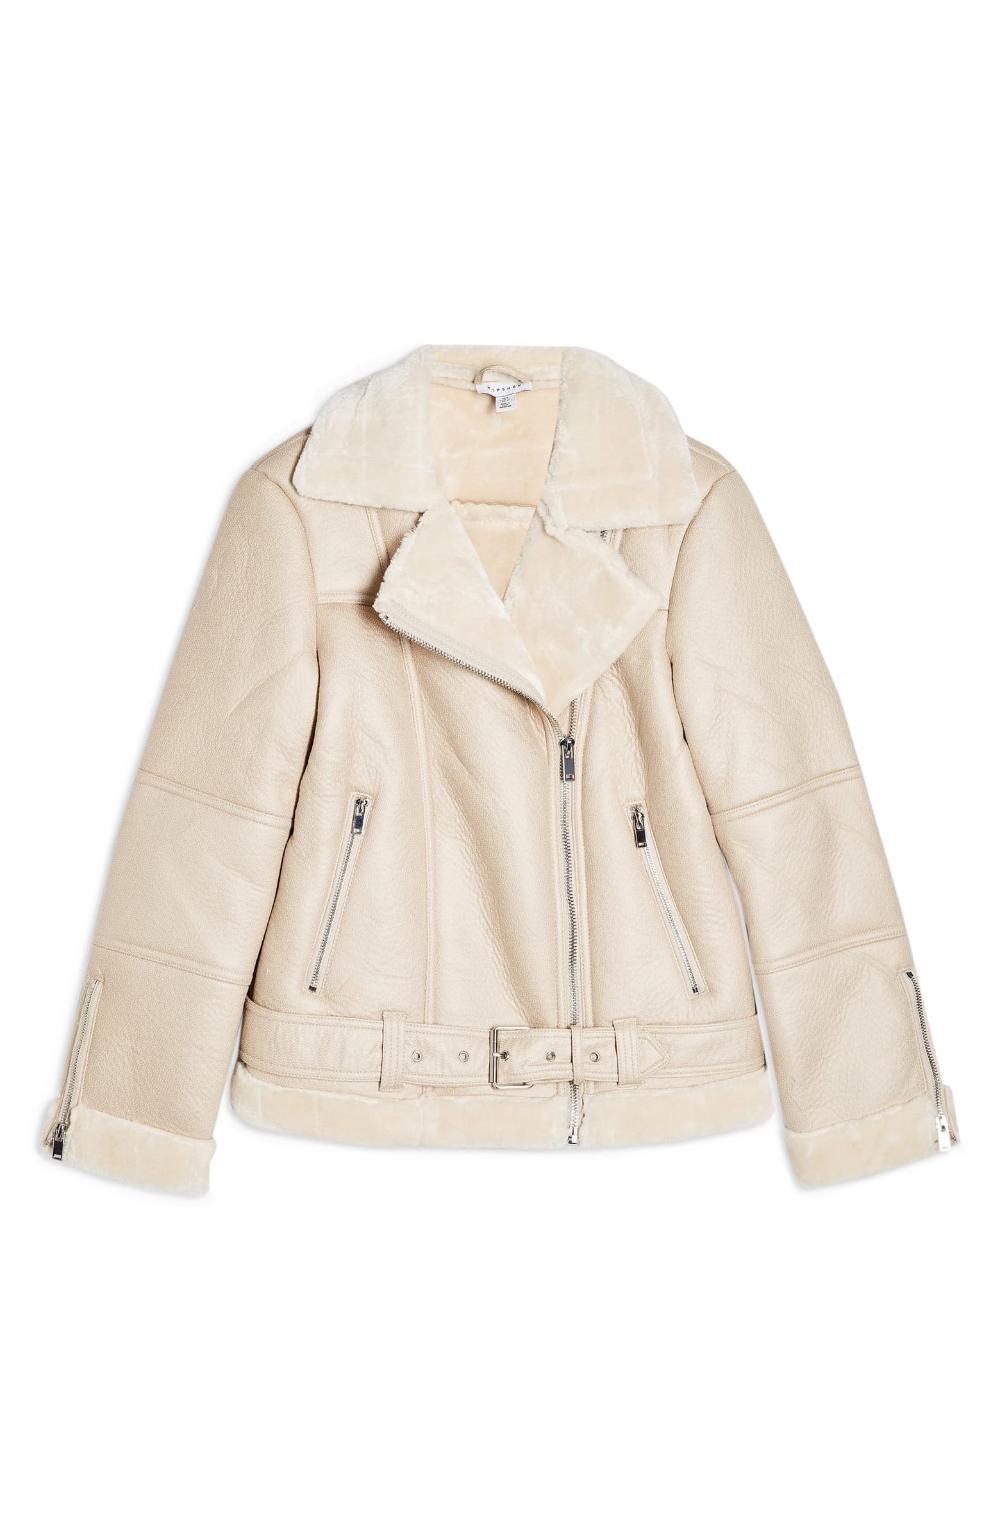 Download Nordstrom Petite Coats  PNG